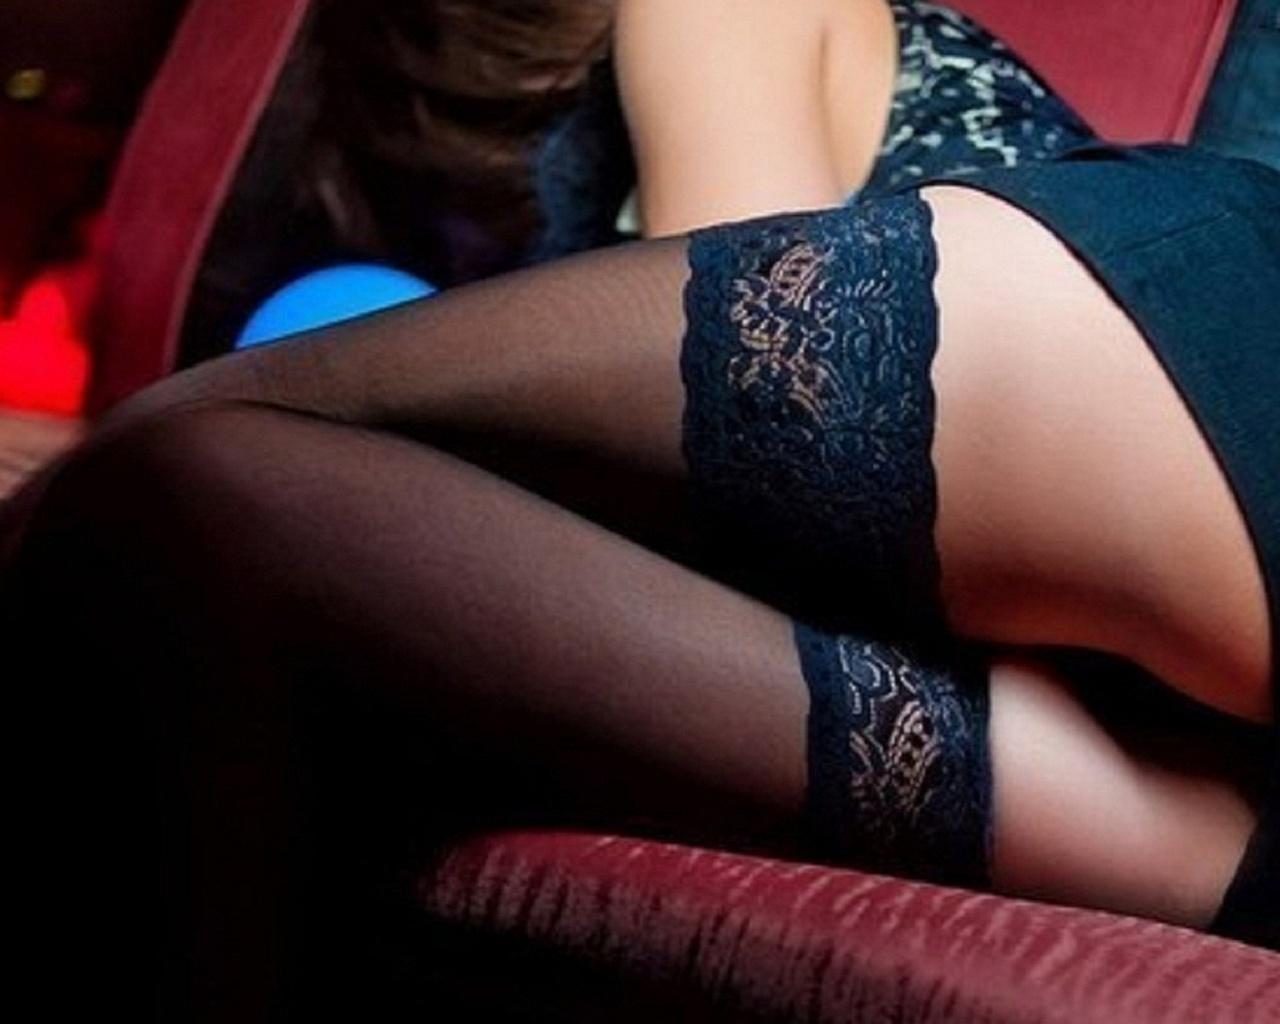 Фото ног в чулках и бикини, секс малицкий девушками